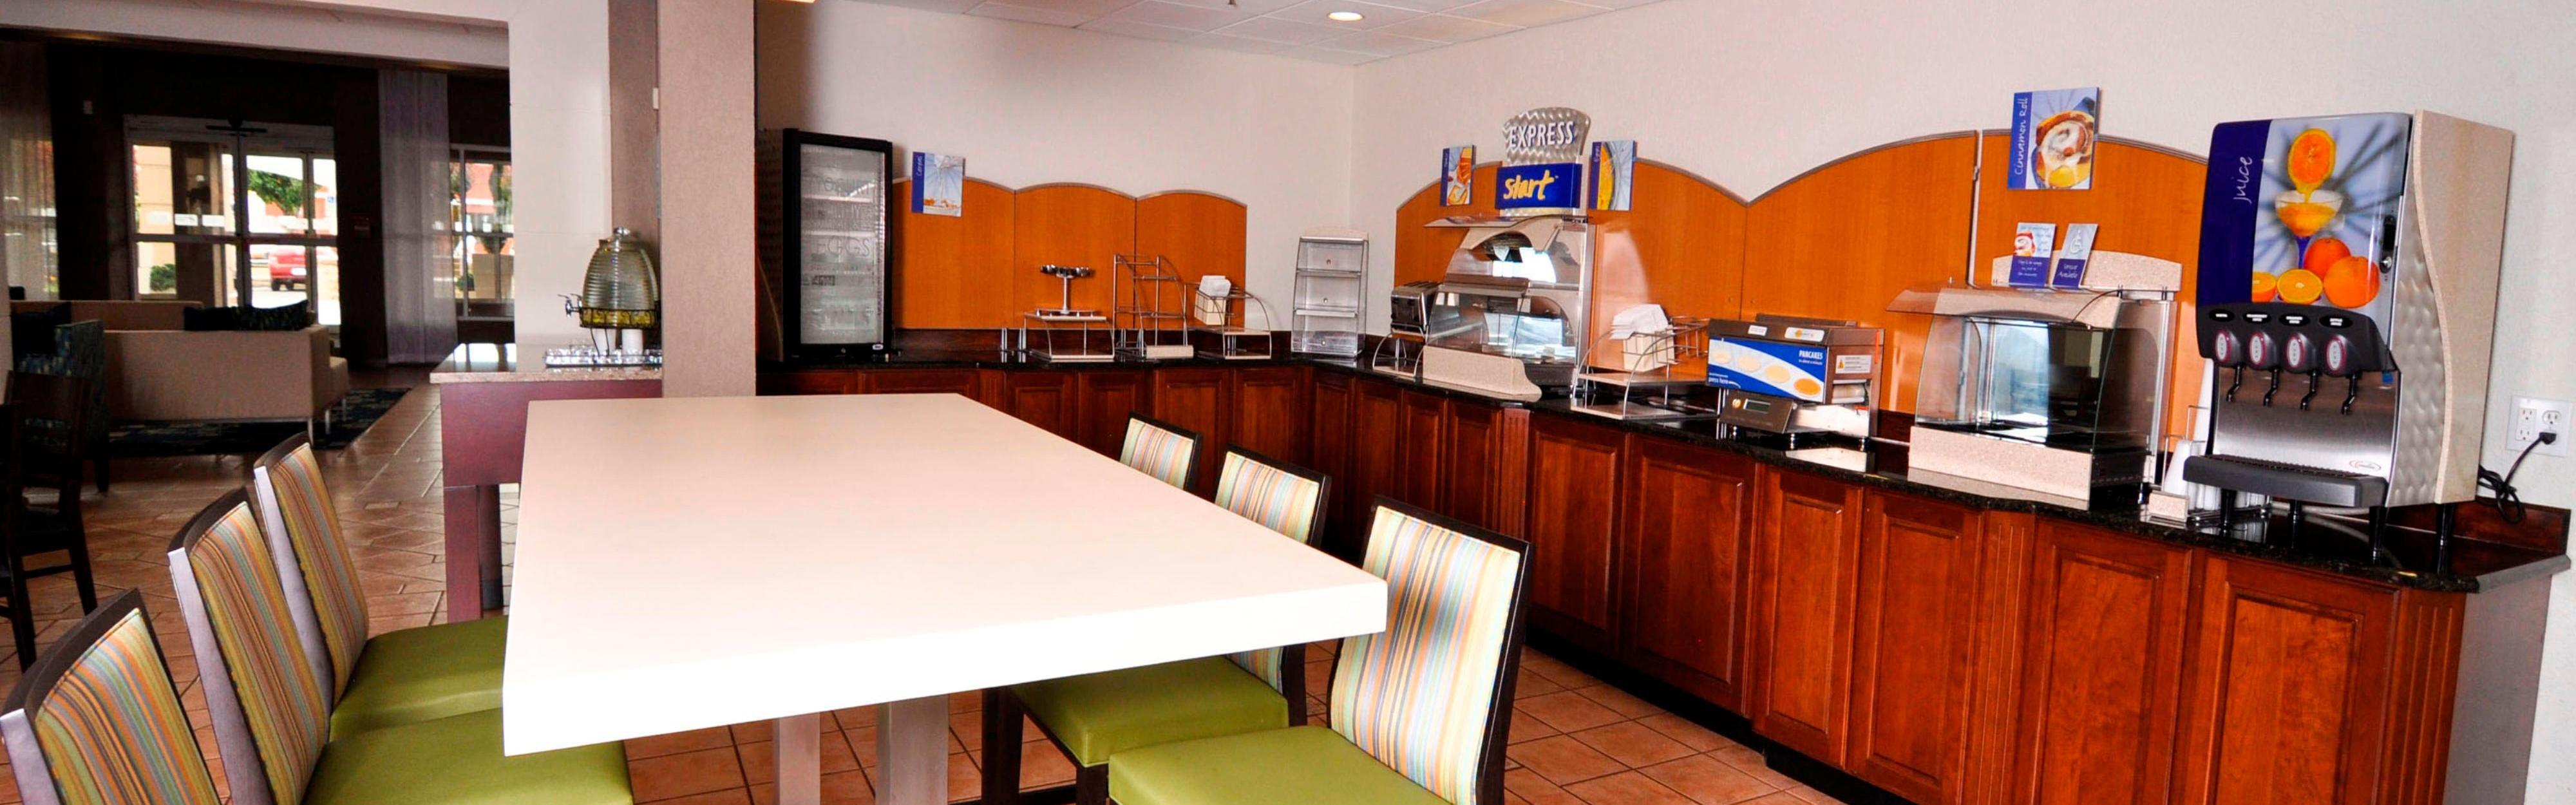 Holiday Inn Express & Suites Port Clinton-Catawba Island image 3